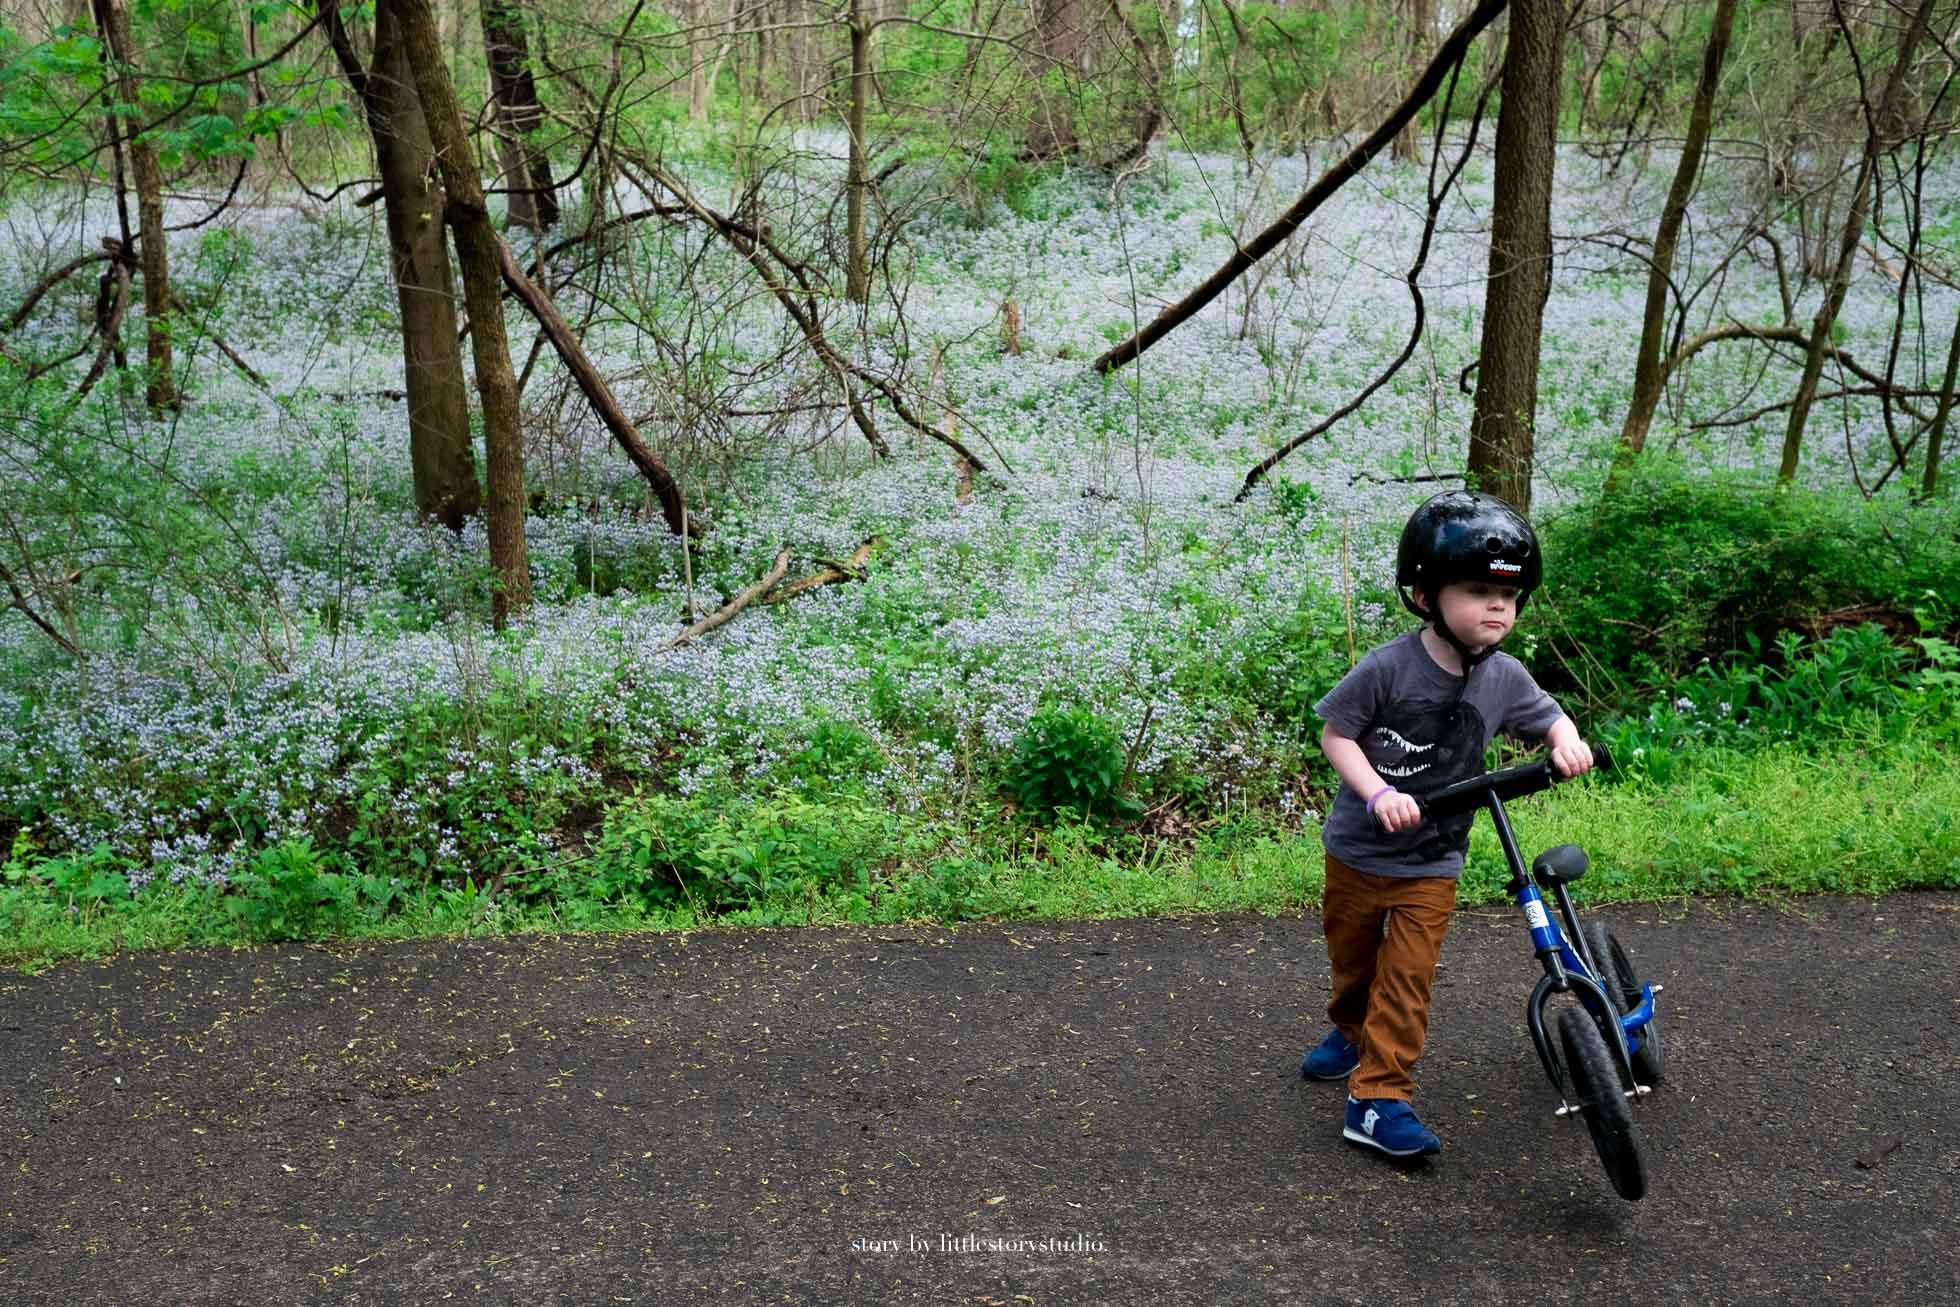 spring-wildflowers-and-boy-on-bike